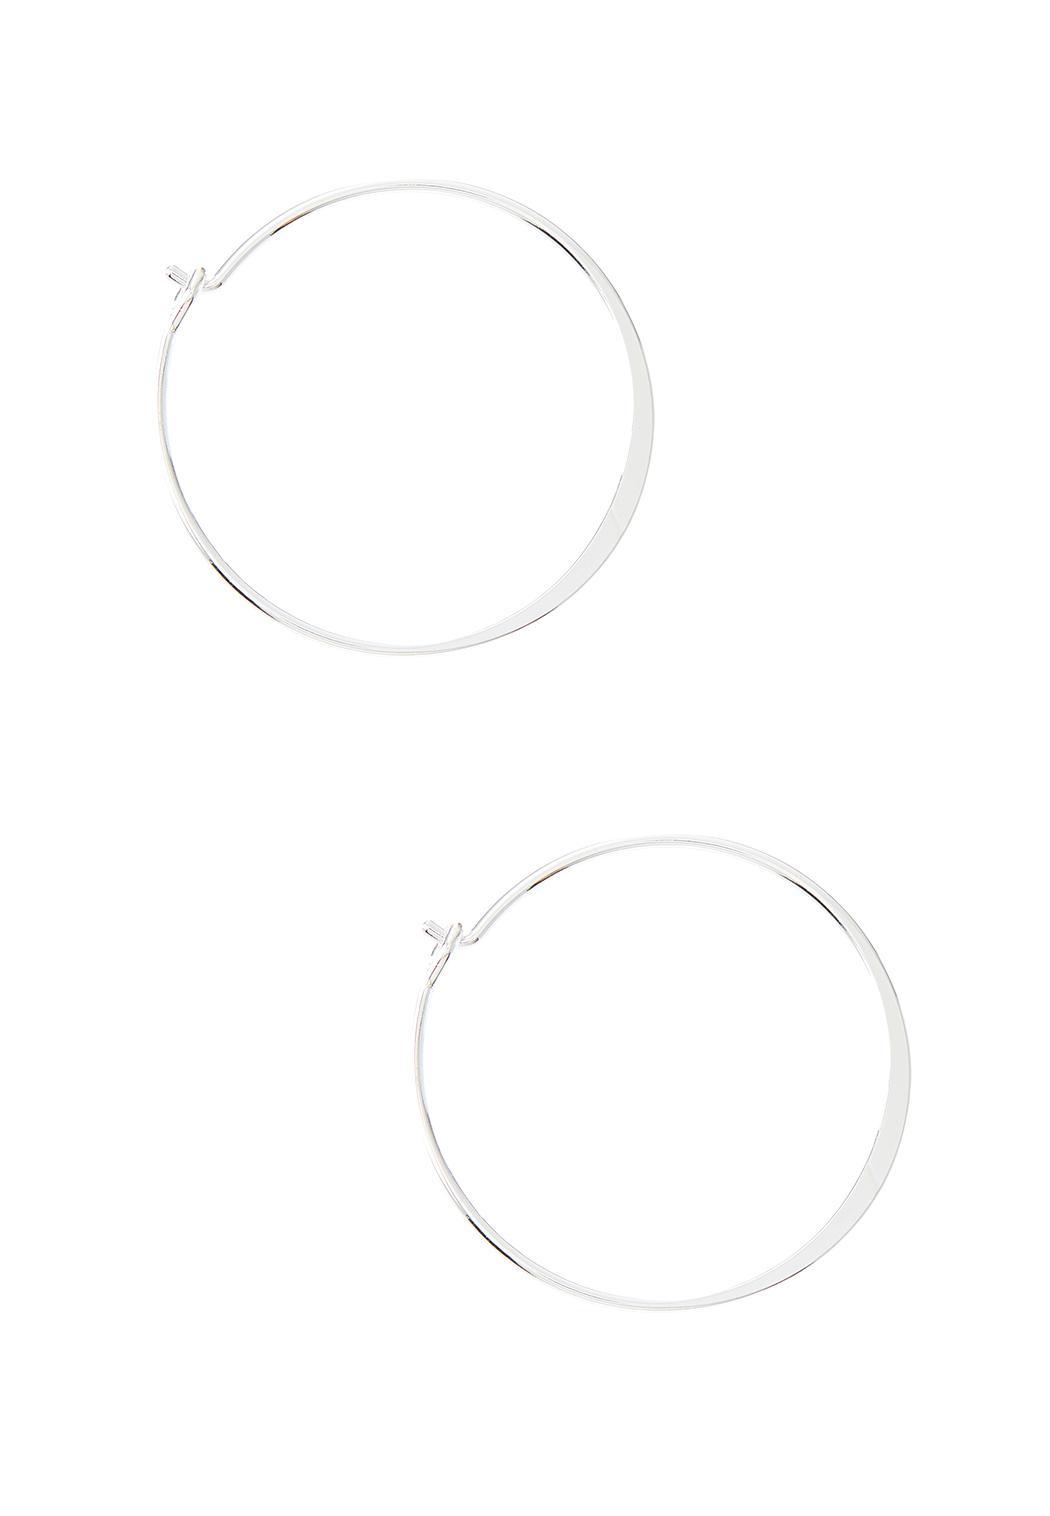 Thin Silver Hoop Earrings